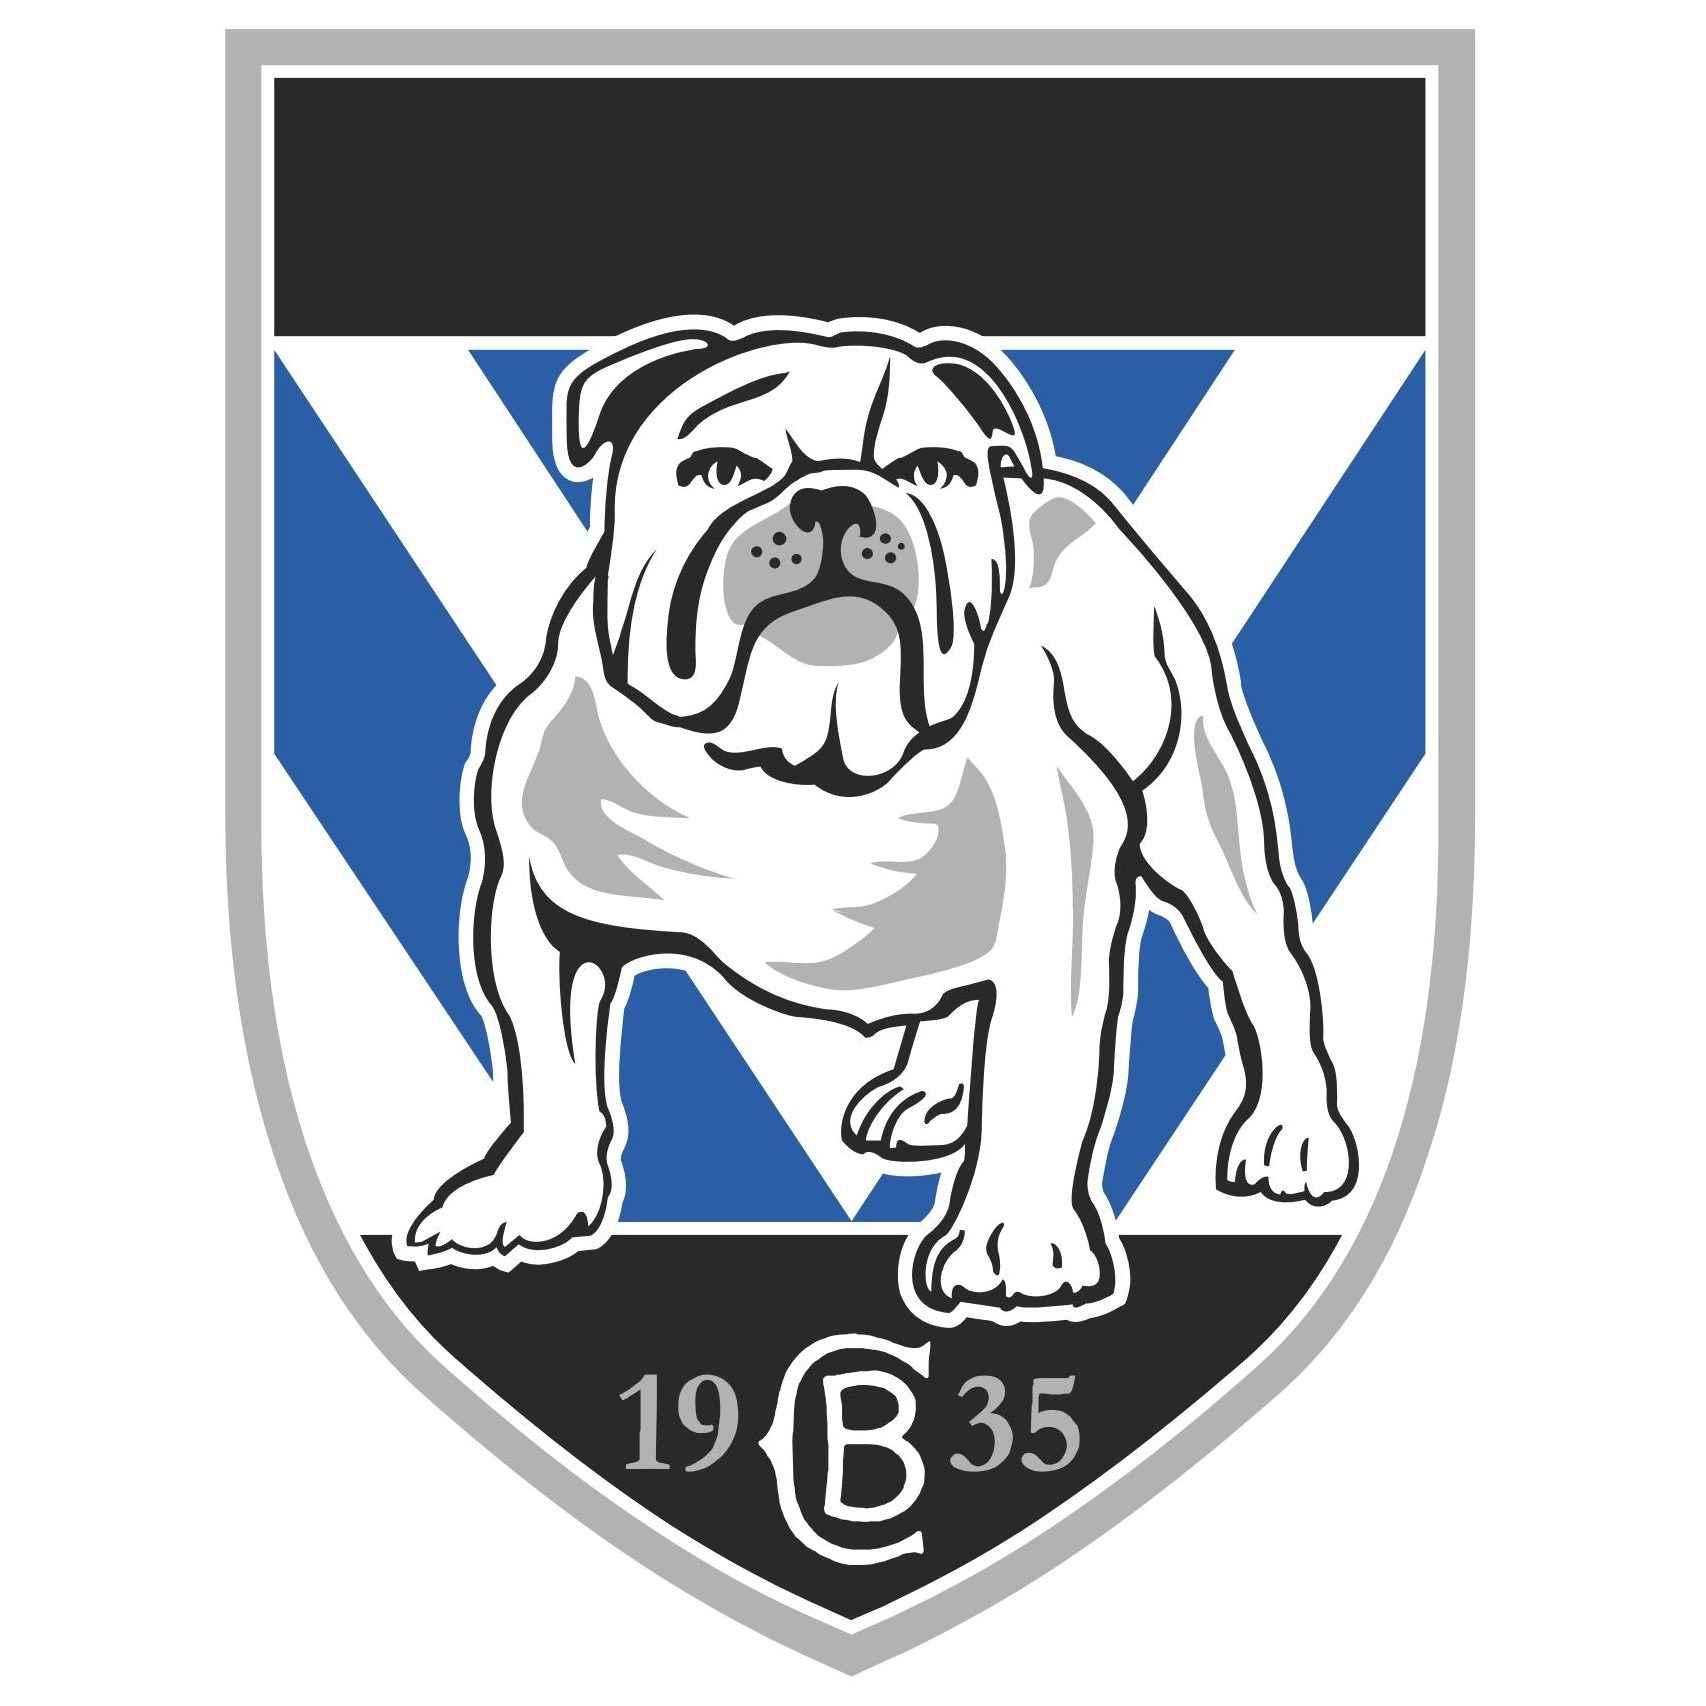 Canterbury-Bankstown_Bulldogs_Logo